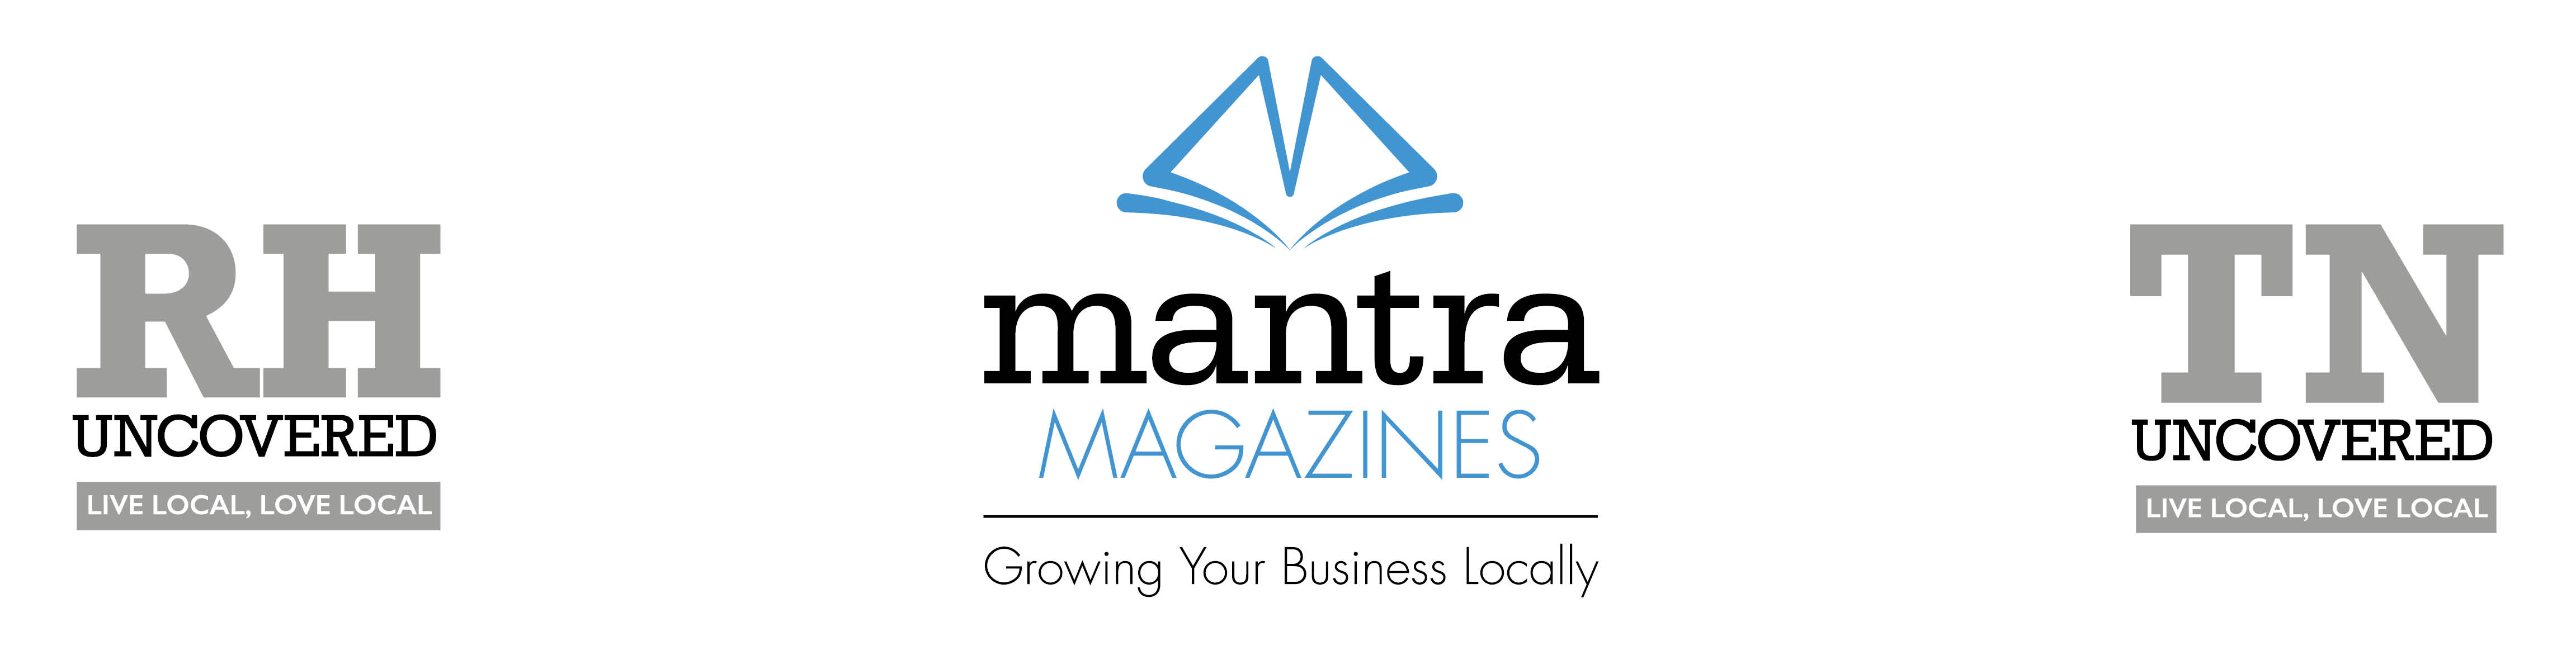 Mantra Magazines Ltd